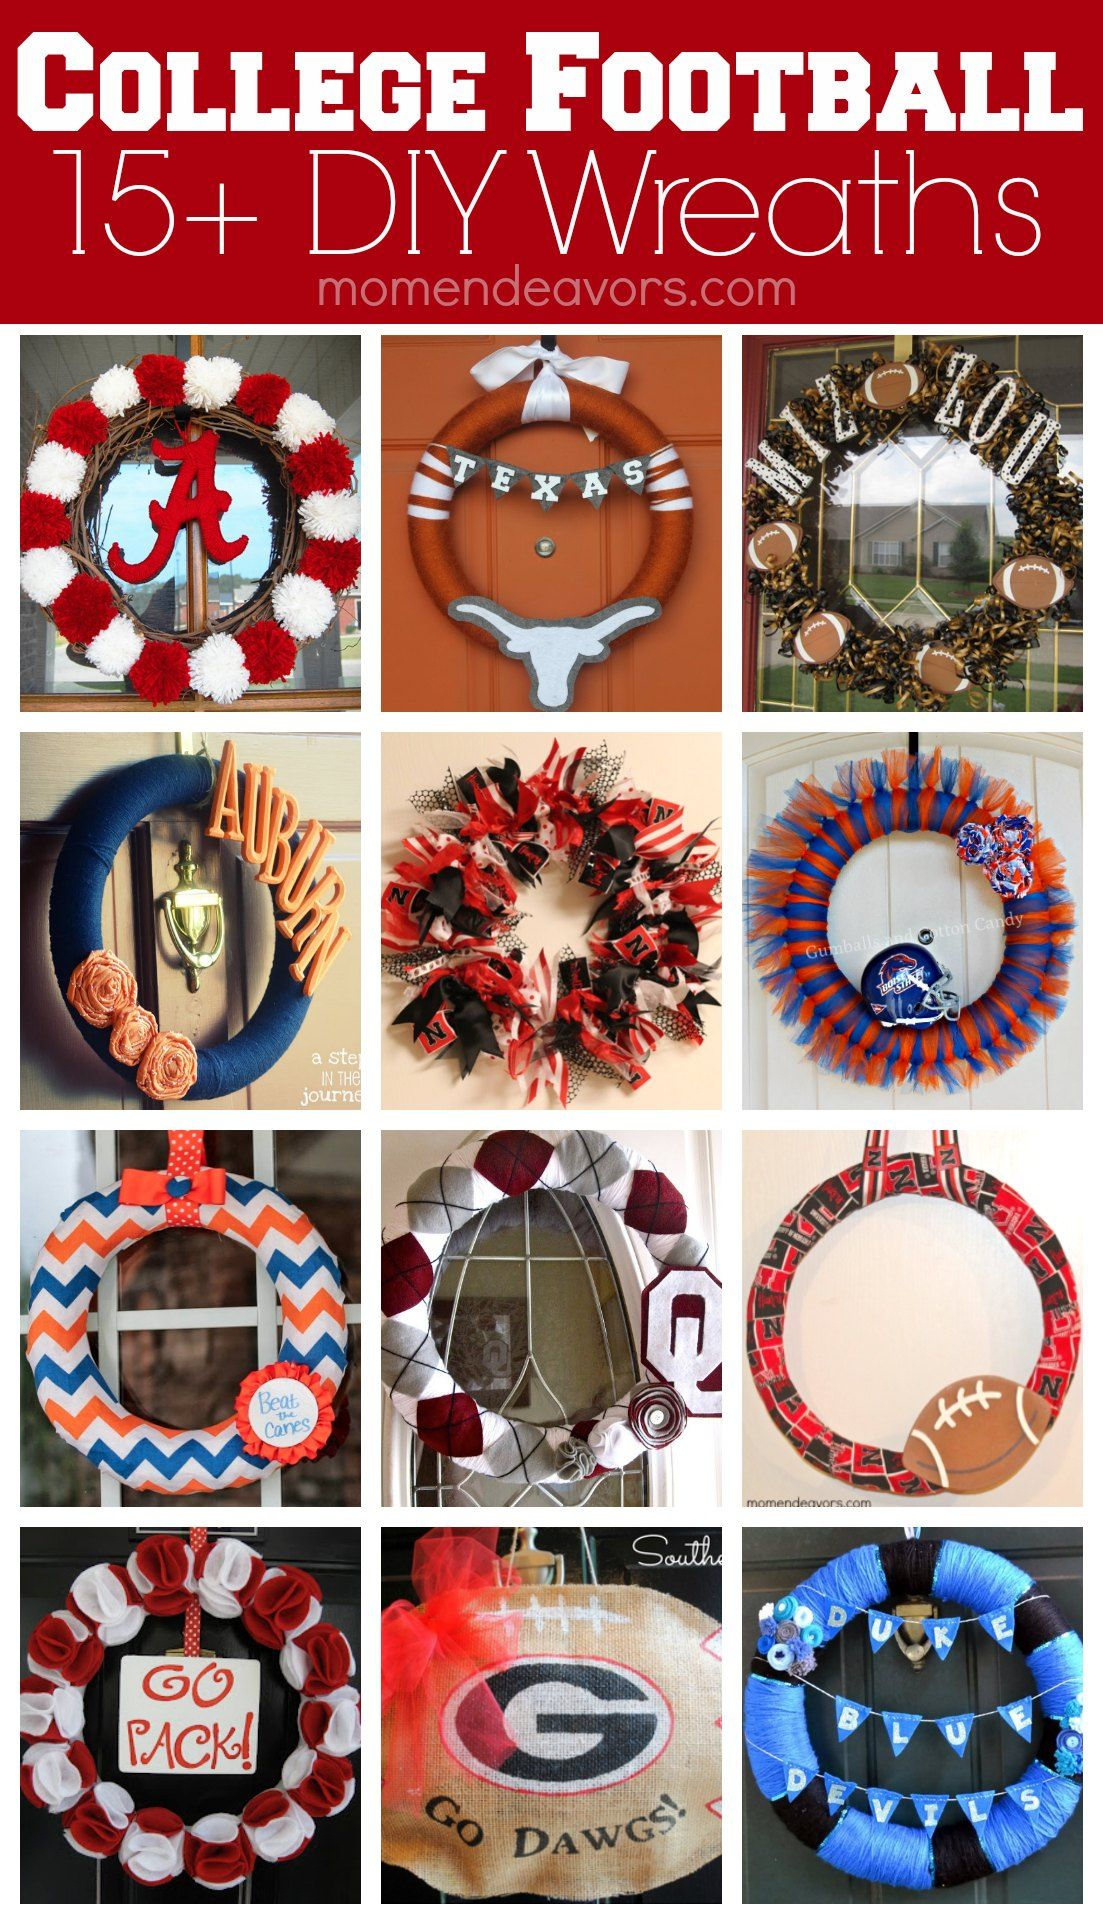 15 Diy College Football Wreath Tutorials Via Momendeavors